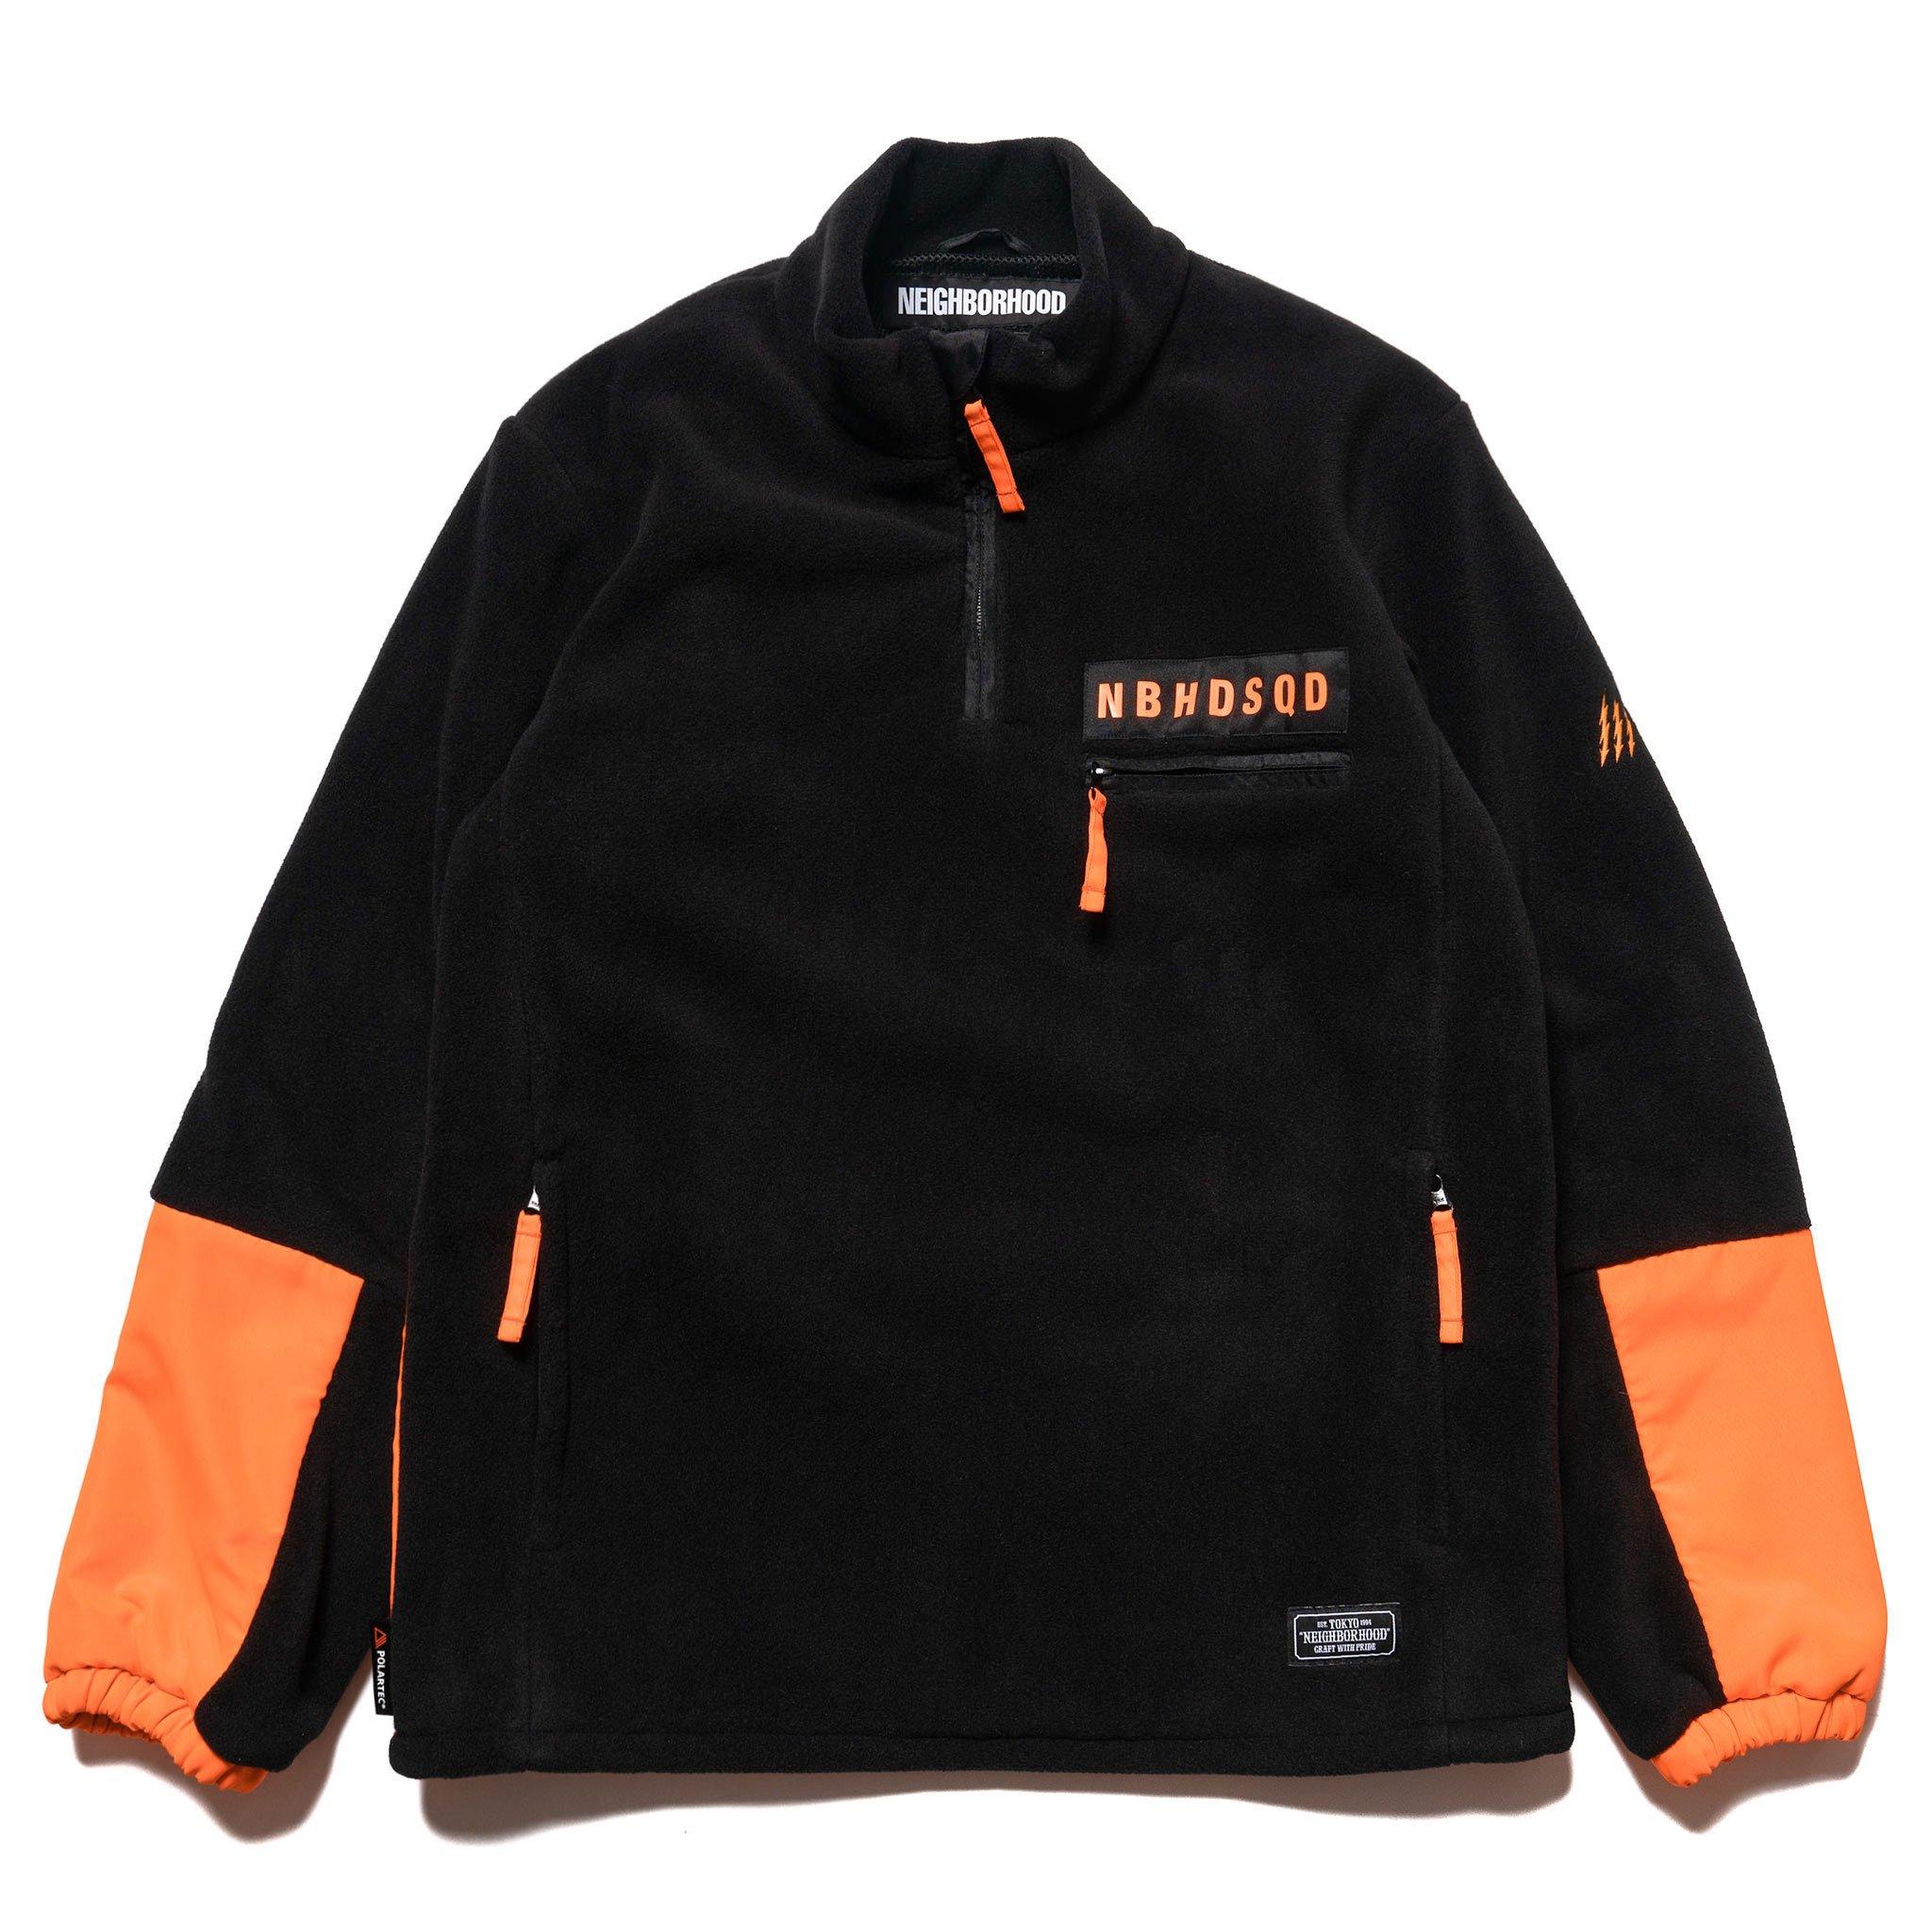 Haven-Neighborhood-SQD-Fleece-E-JKT-Orange-1_2048x2048.jpg